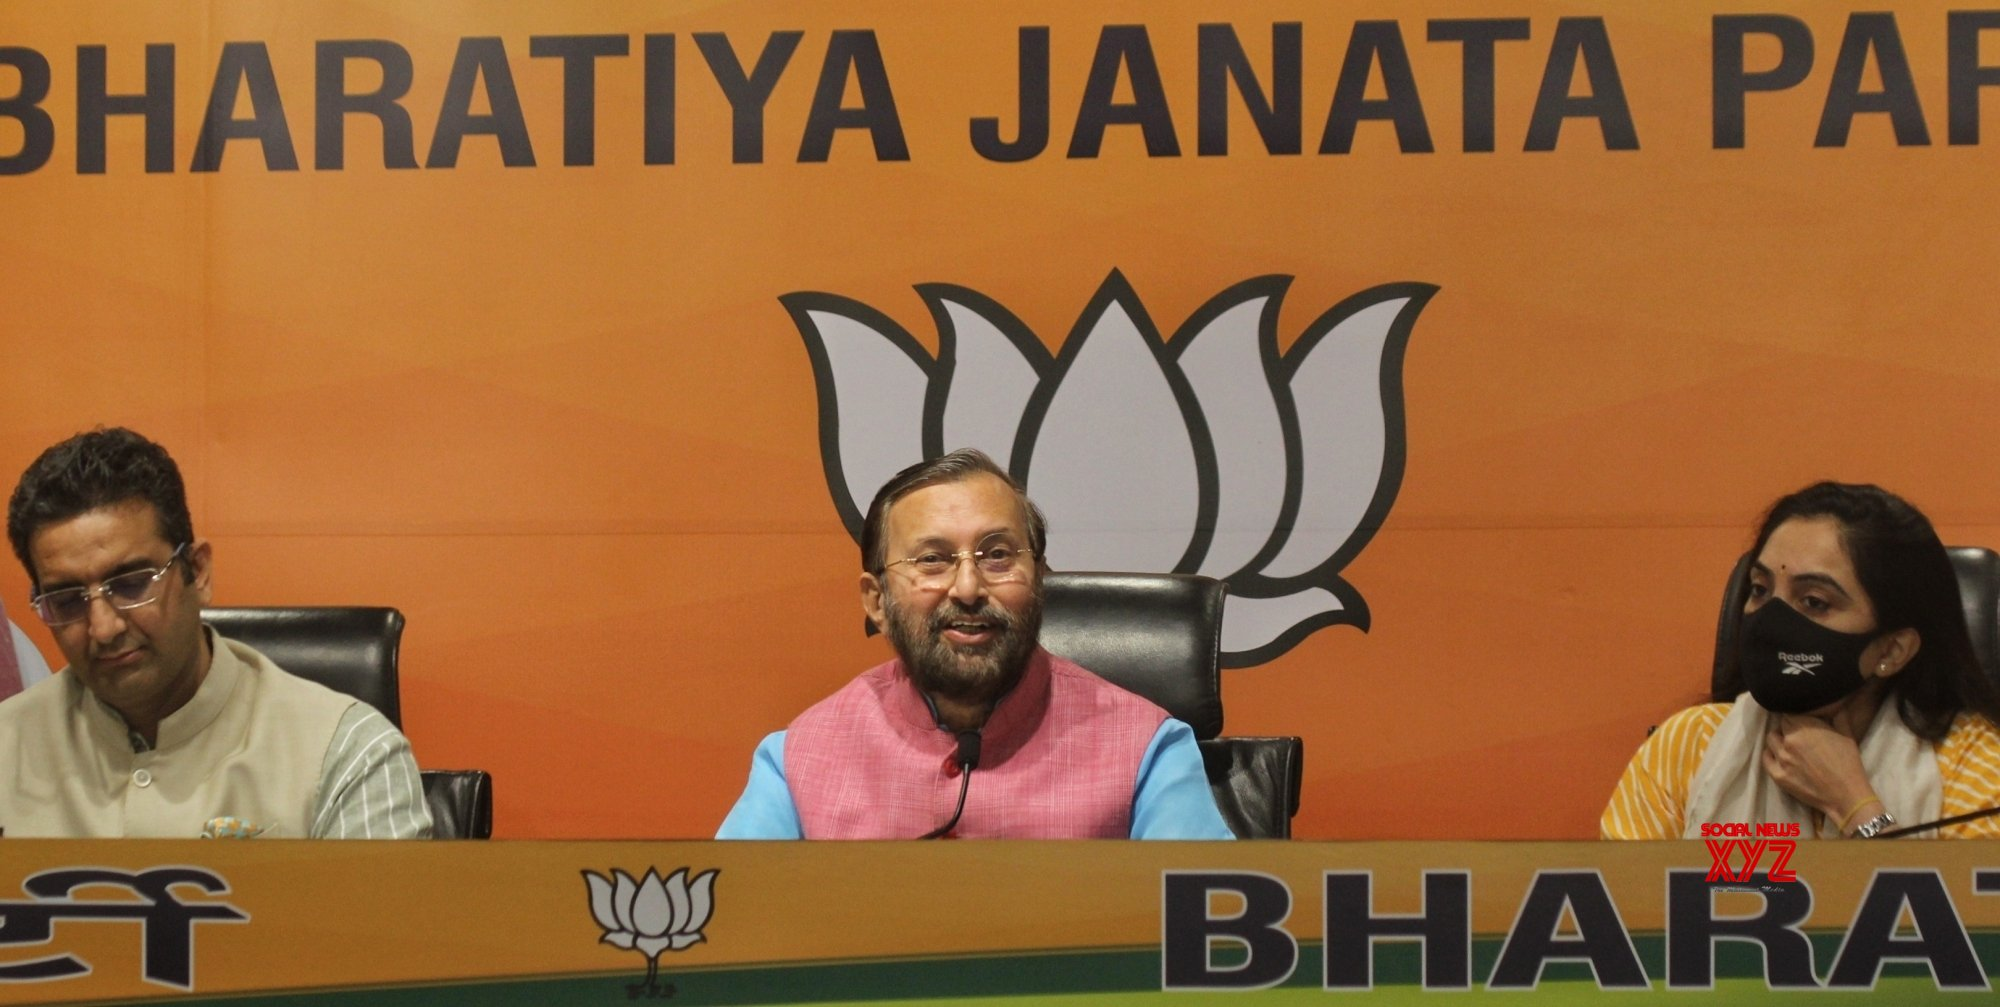 New Delhi: Union Minister Prakash Javadekar address a press conference at BJP HQ, DDU Marg, in New Delhi #Gallery